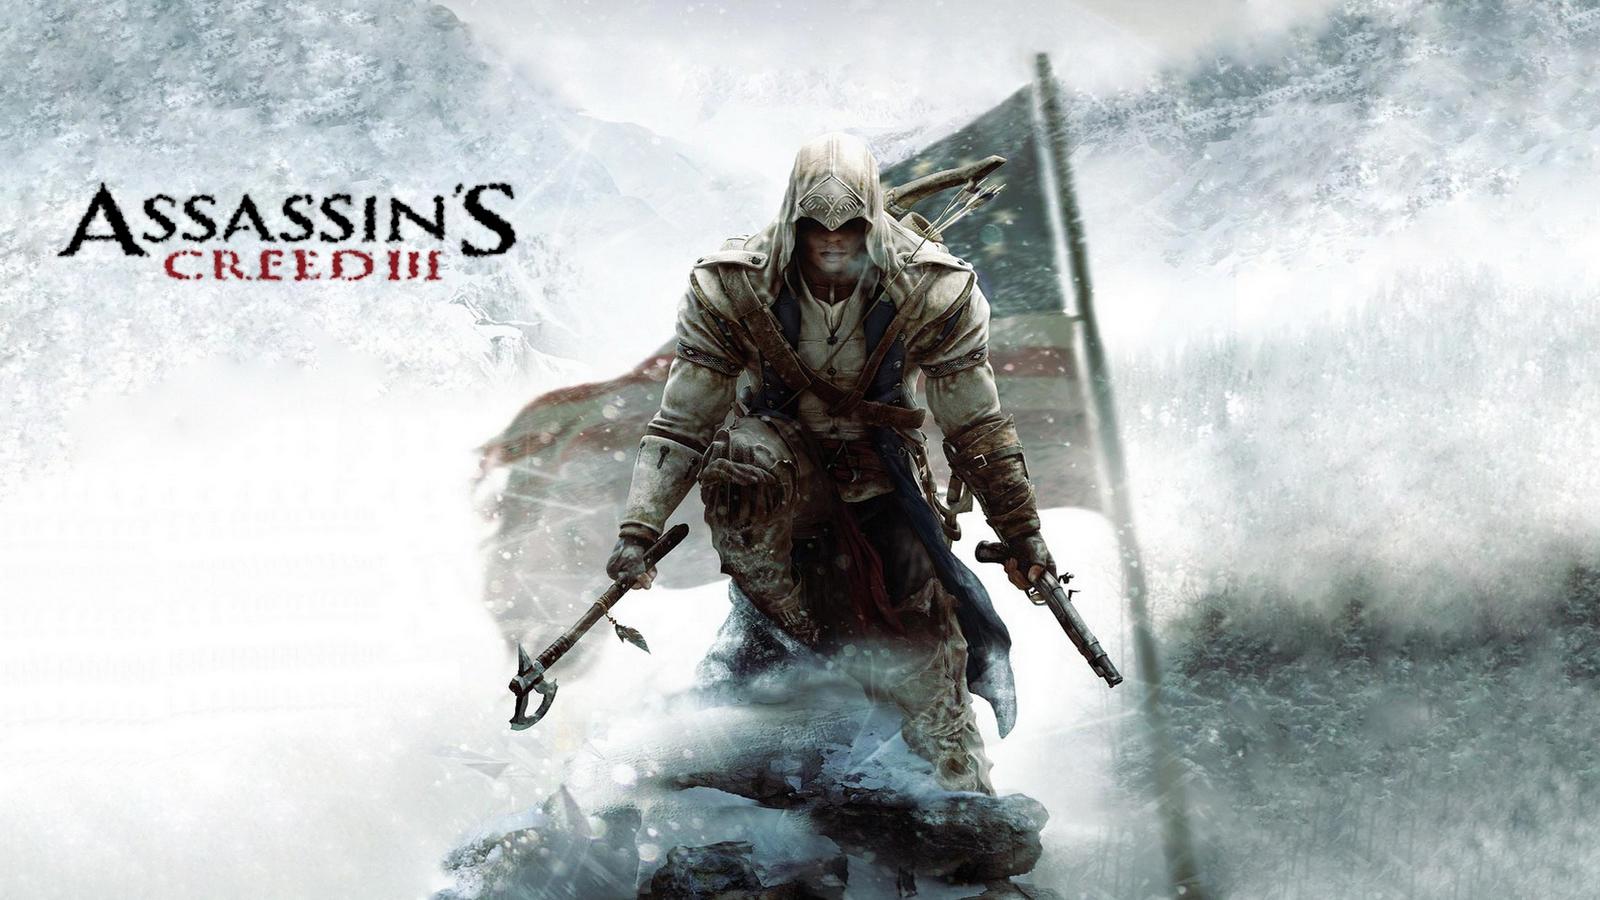 Eyesurfing Assassins Creed 3 Wallpaper 1600x900